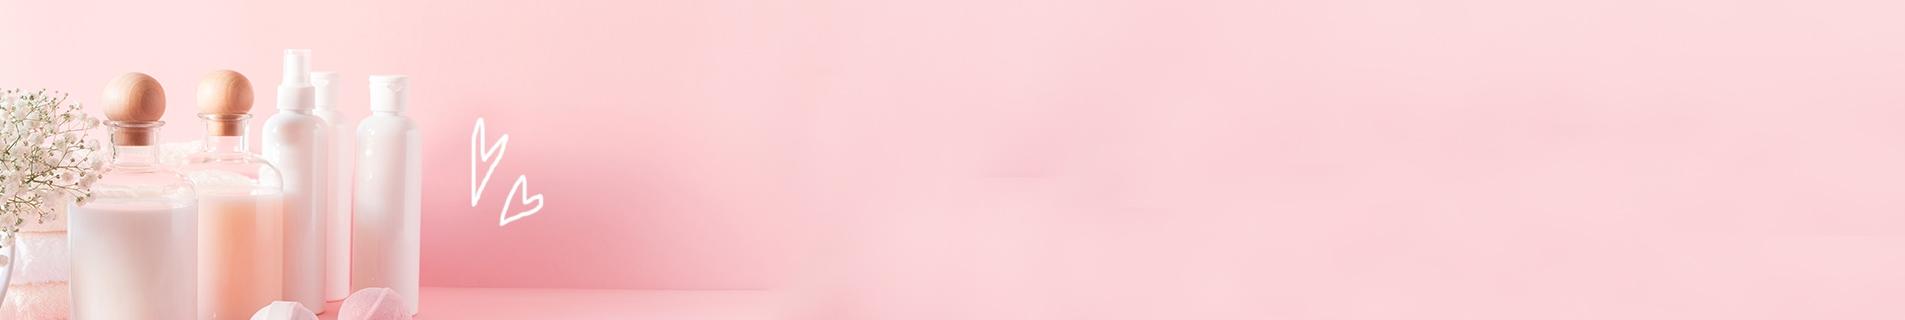 Promo moins de 2€ | Site de maquillage pas cher | SAGA Cosmetics